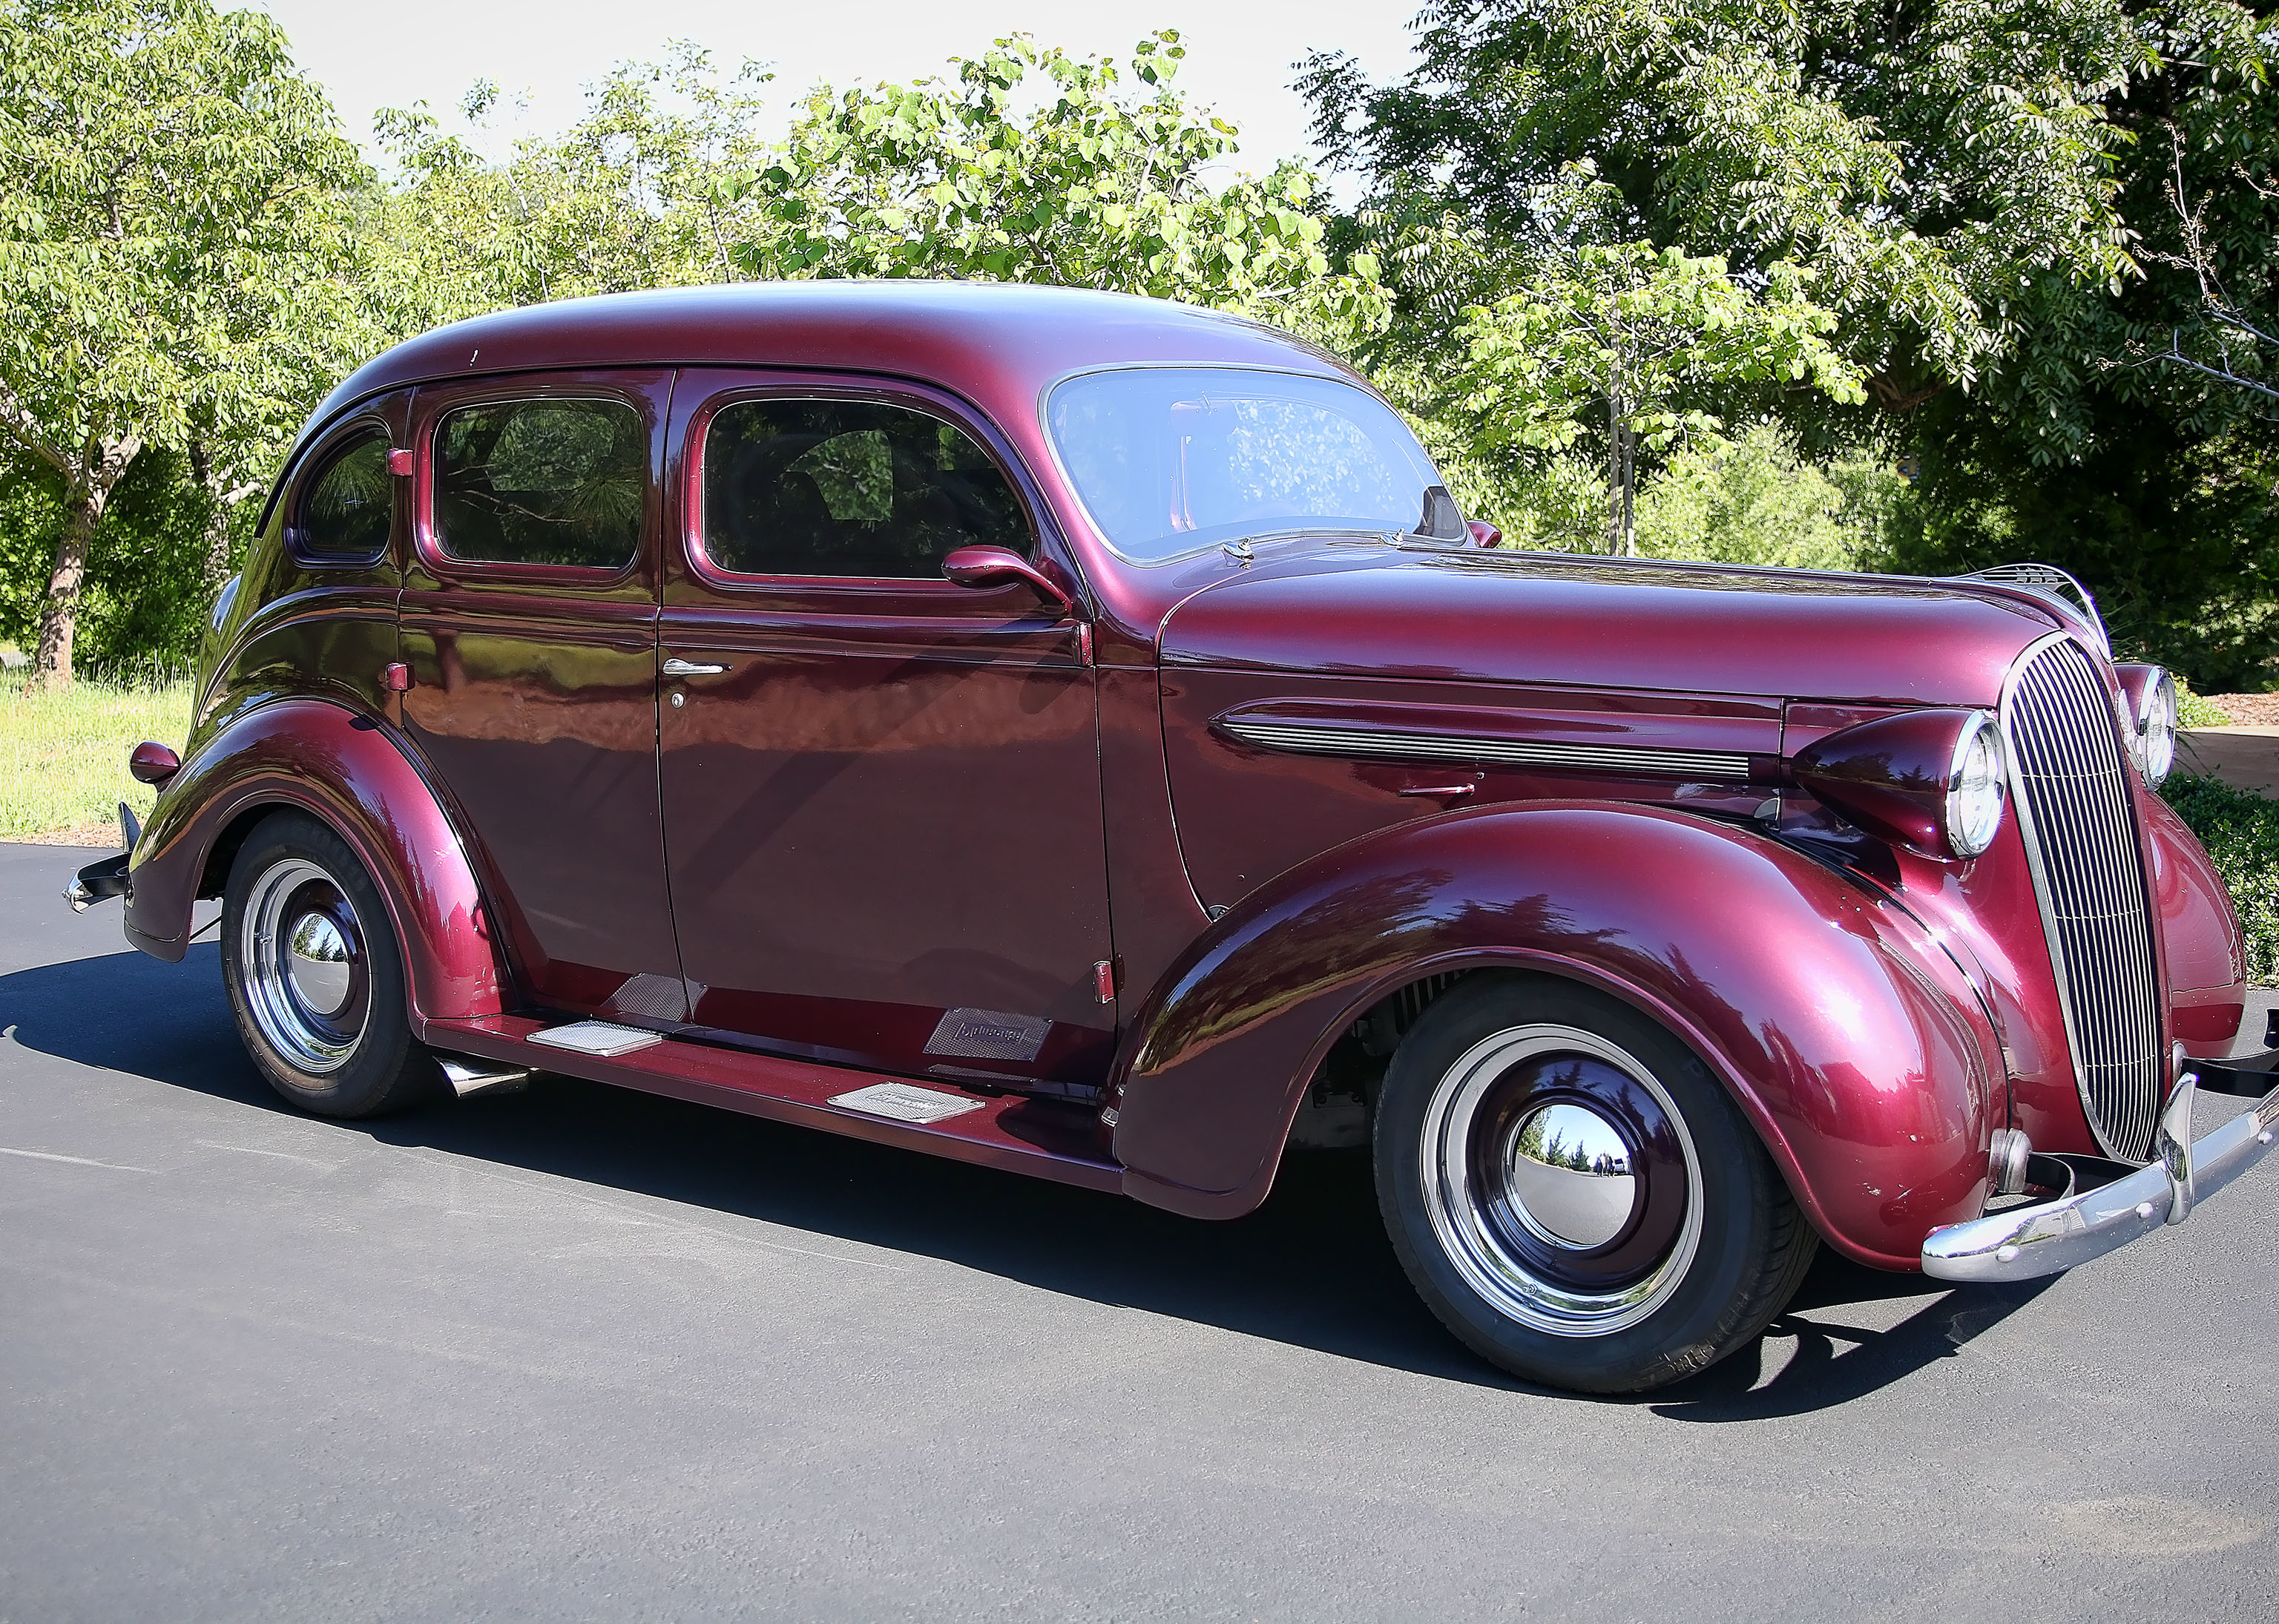 1937 plmouth 4 door sedan for sale for 1937 ford 4 door sedan for sale